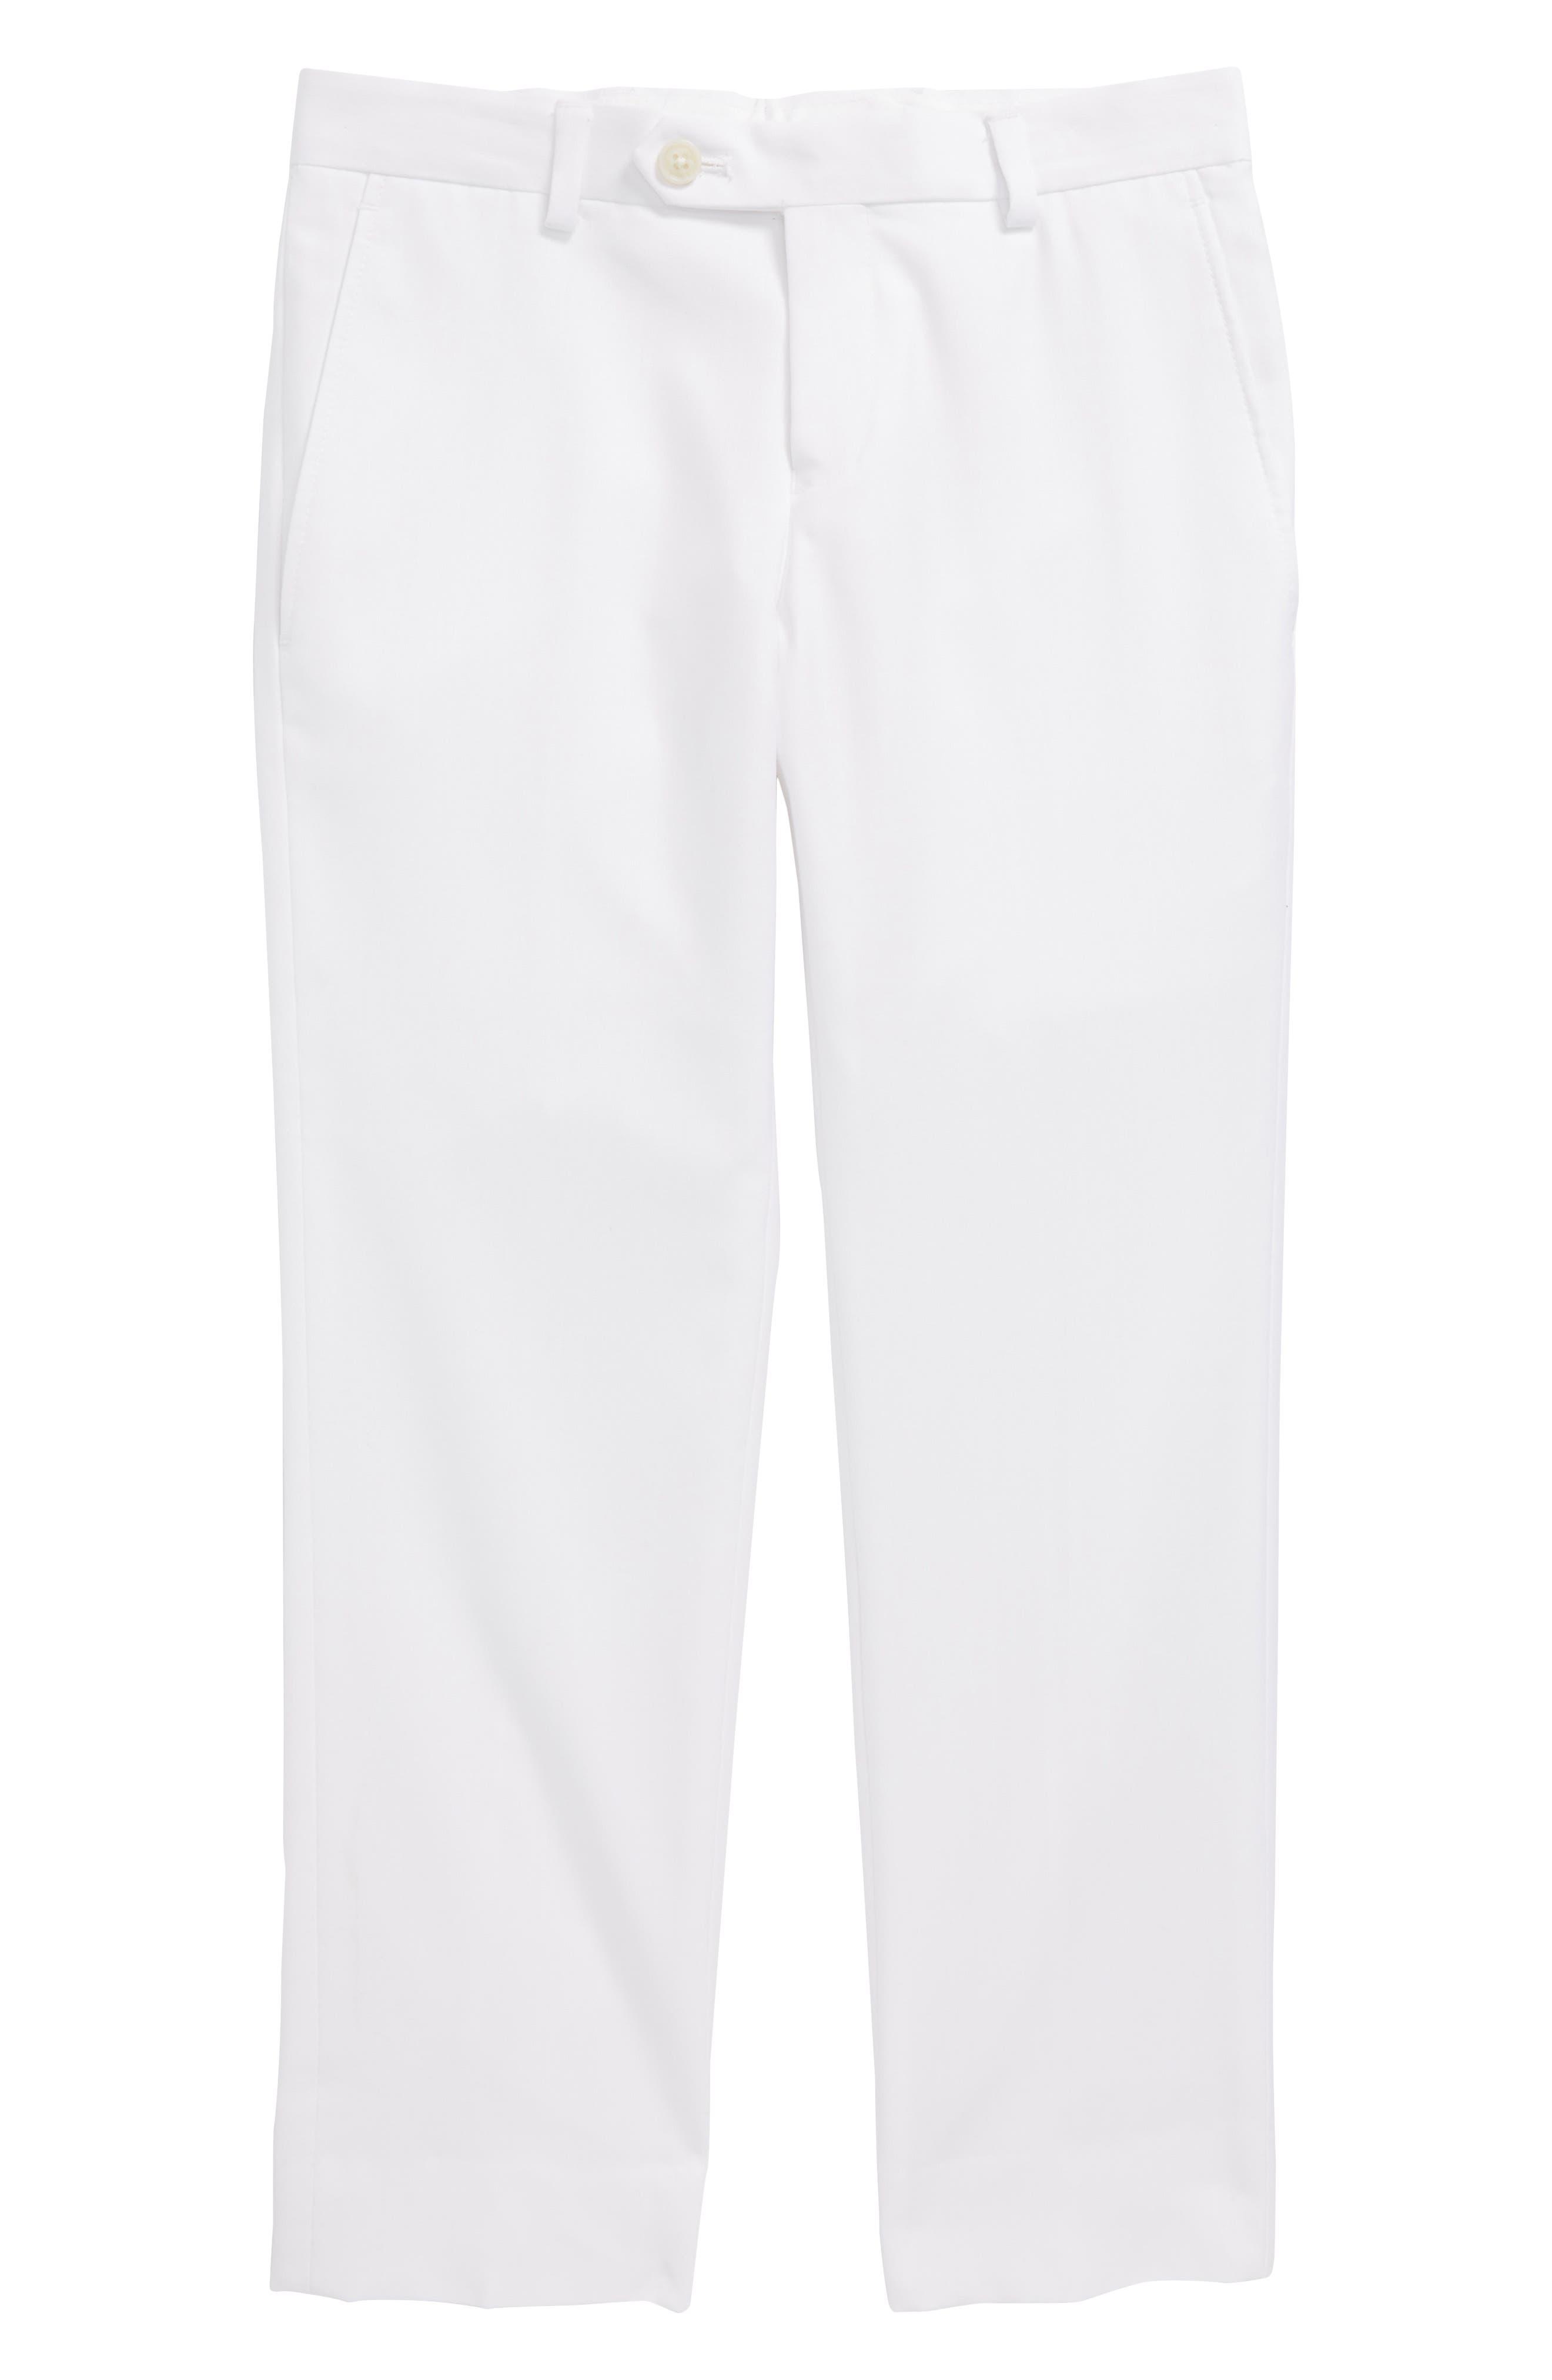 Flat Front Pants,                         Main,                         color, White